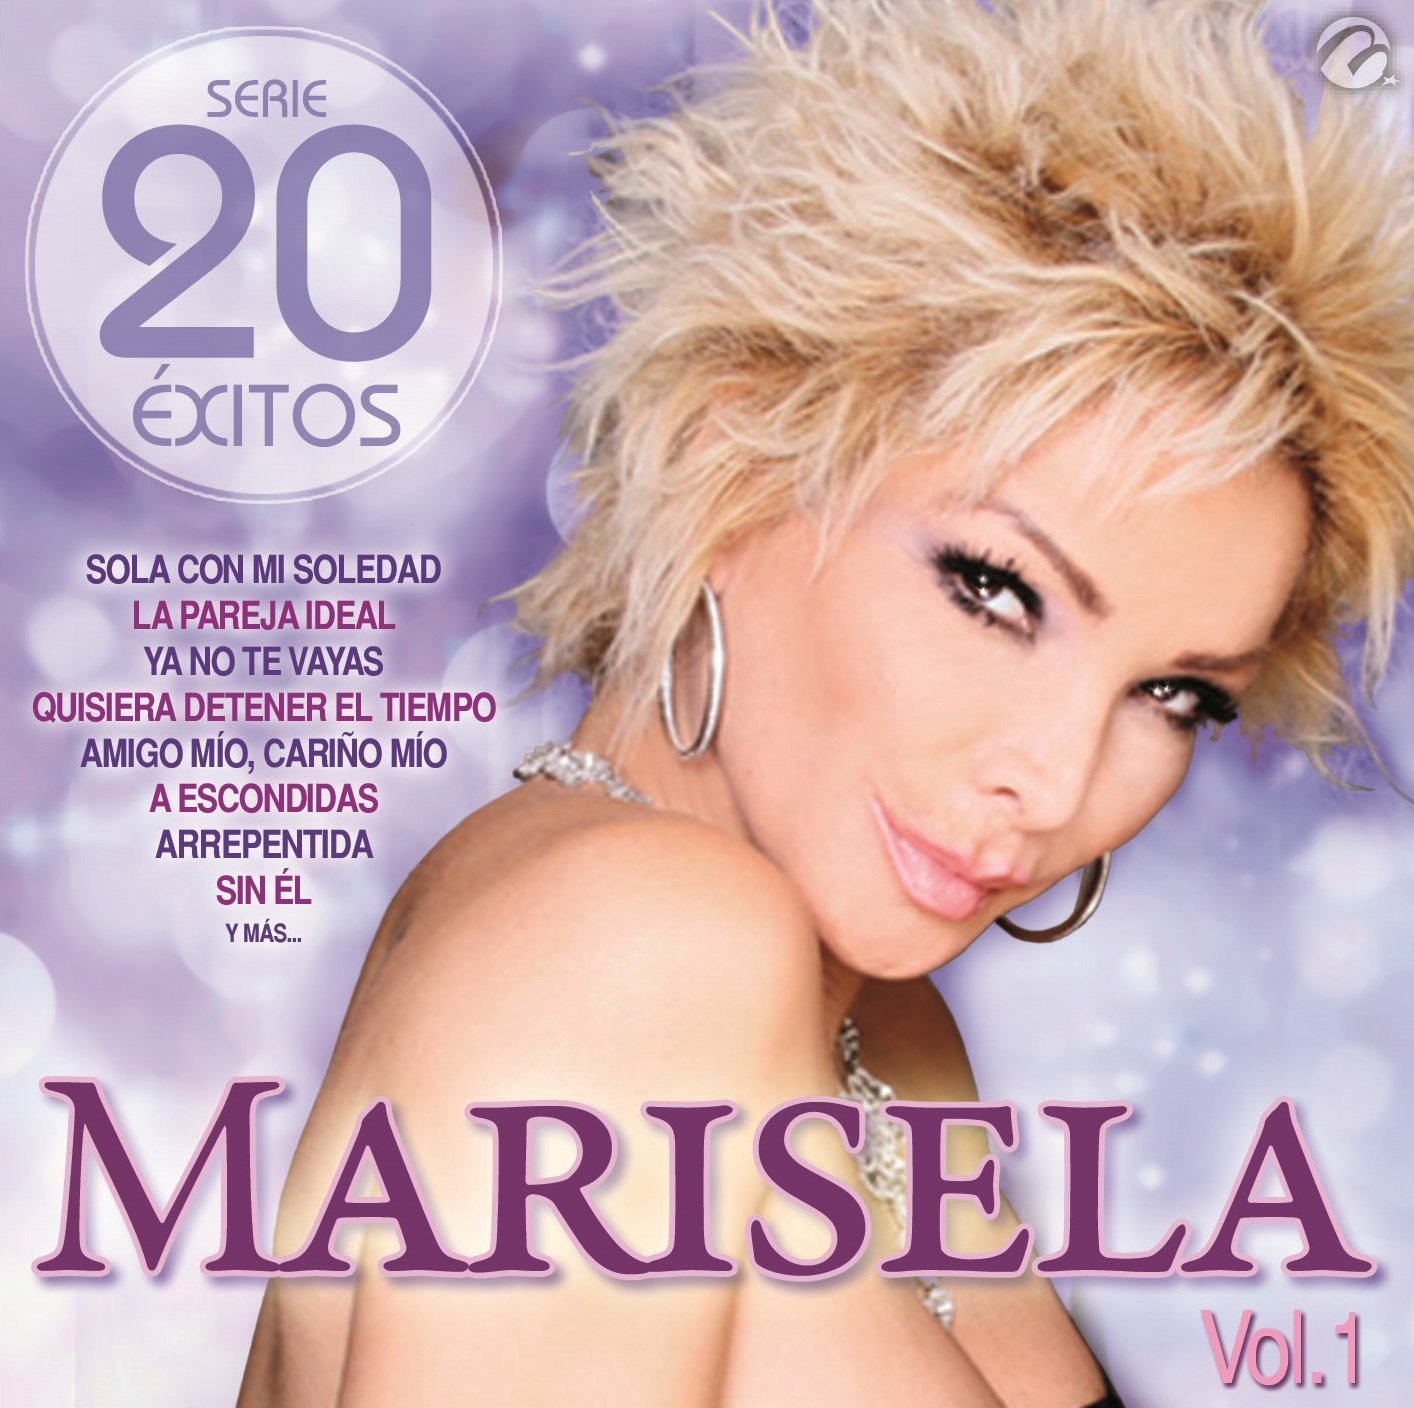 MARISELA - 20 EXITOS VOL 1 - Amazon.com Music